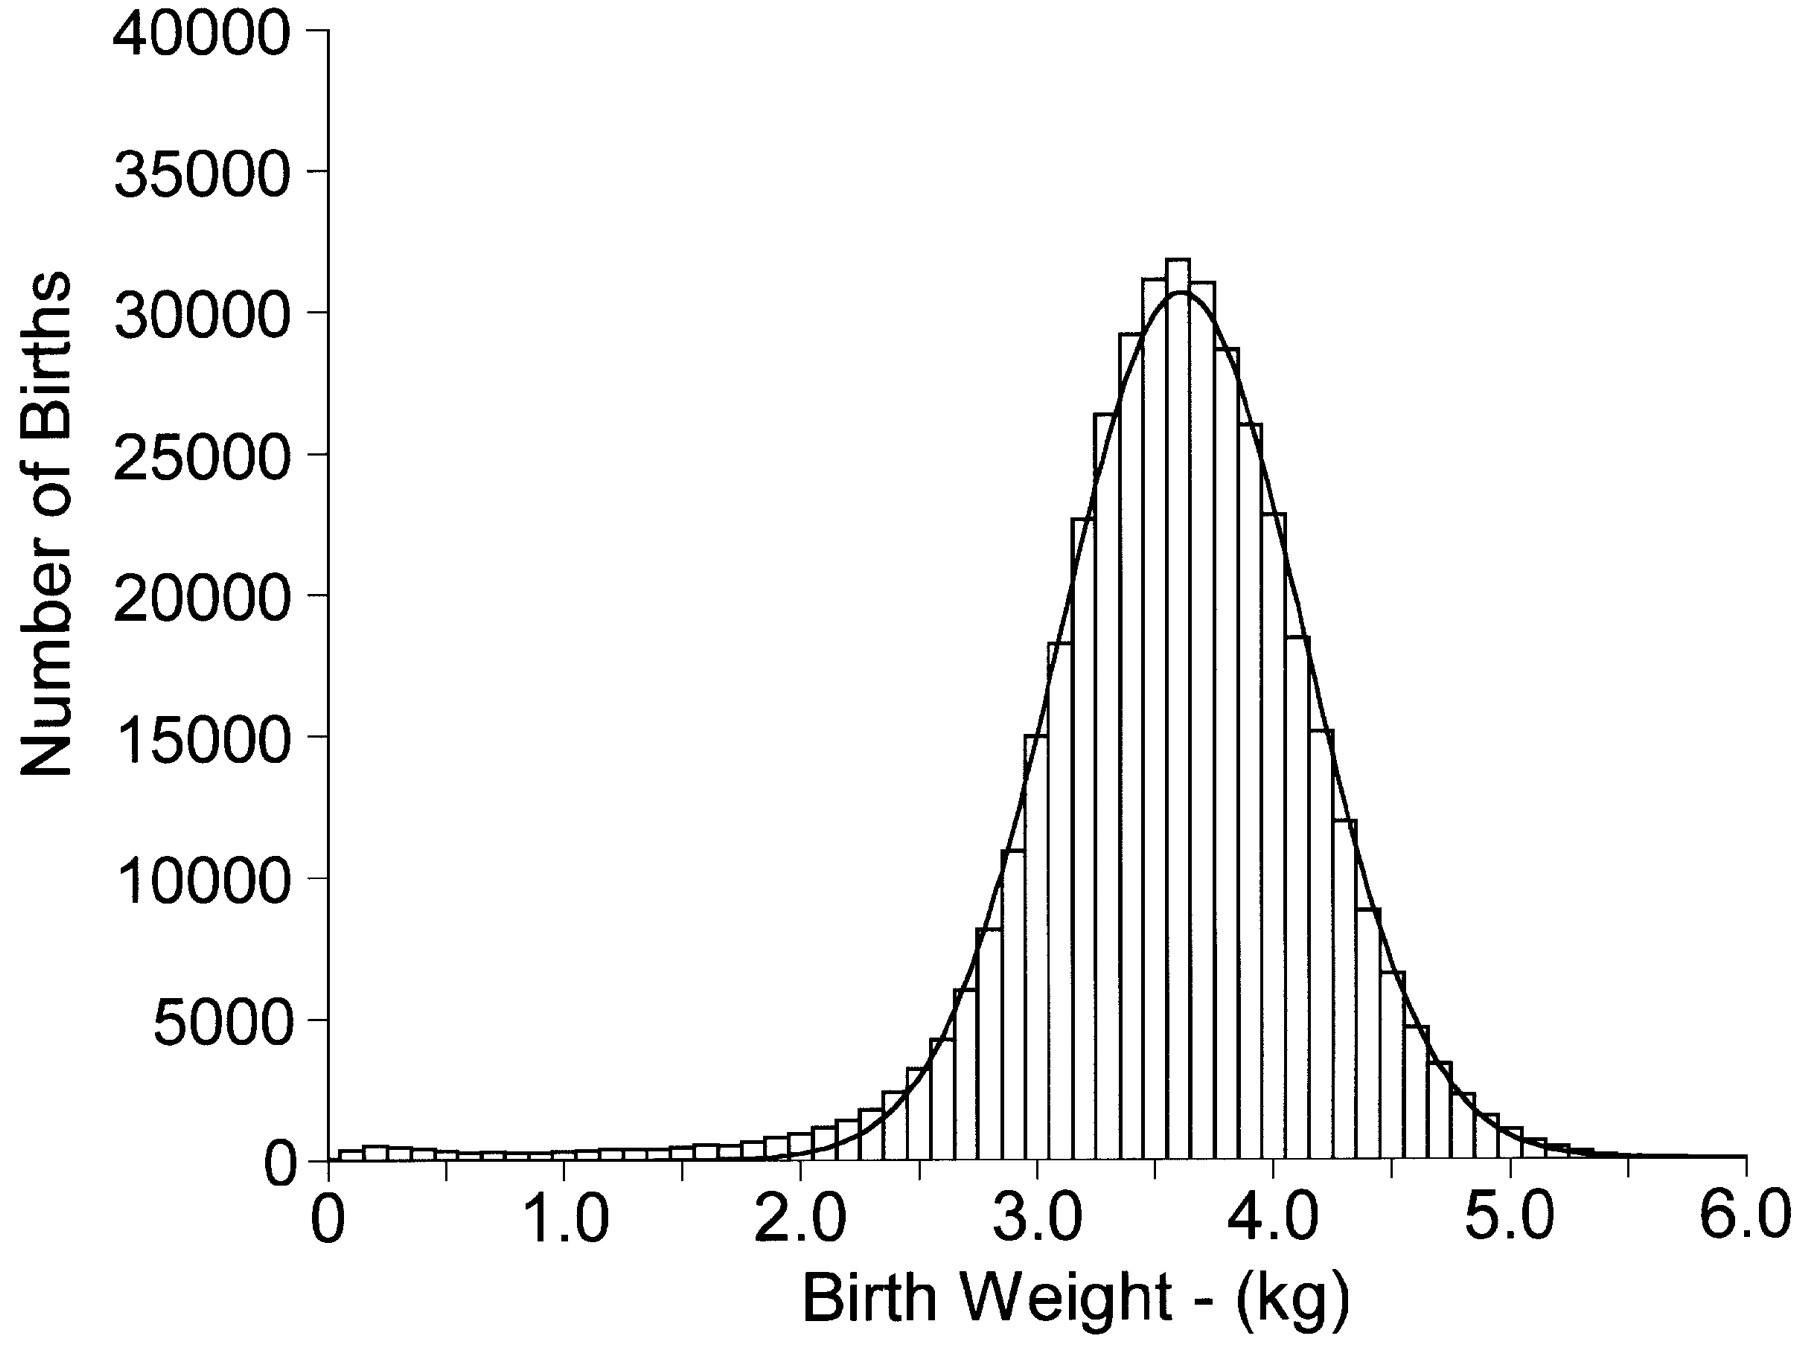 Birth Weight Distribution